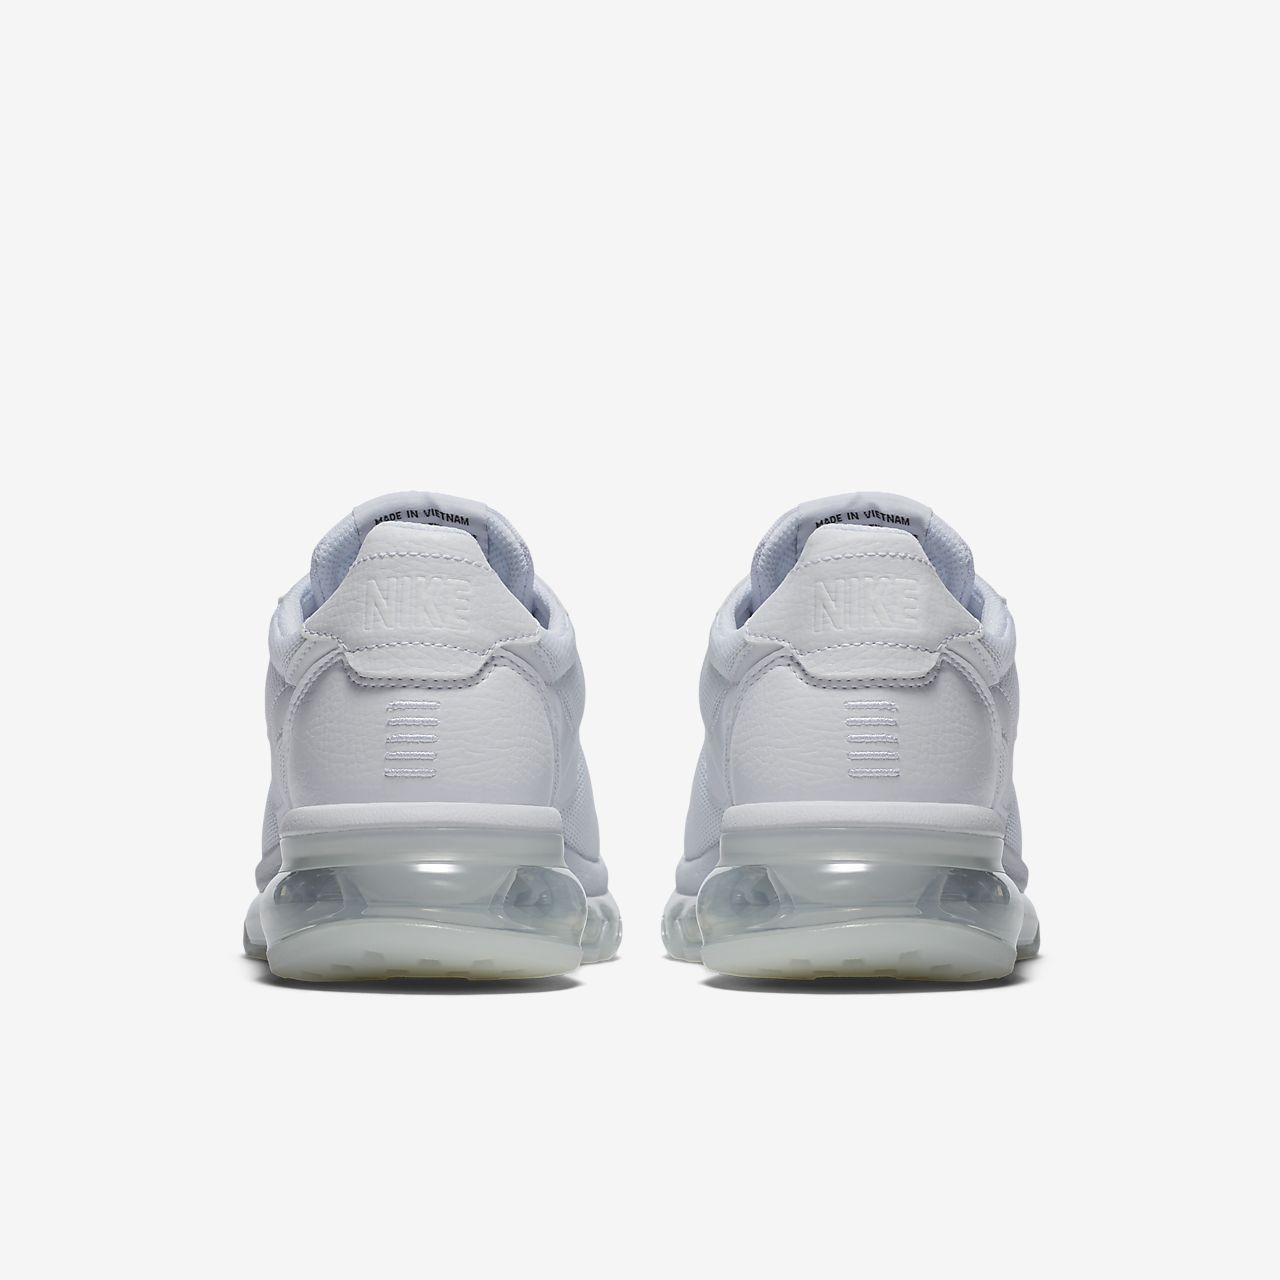 Chaussure Nike Max Air Max Nike Ld Zero Pour Fr b91ef8